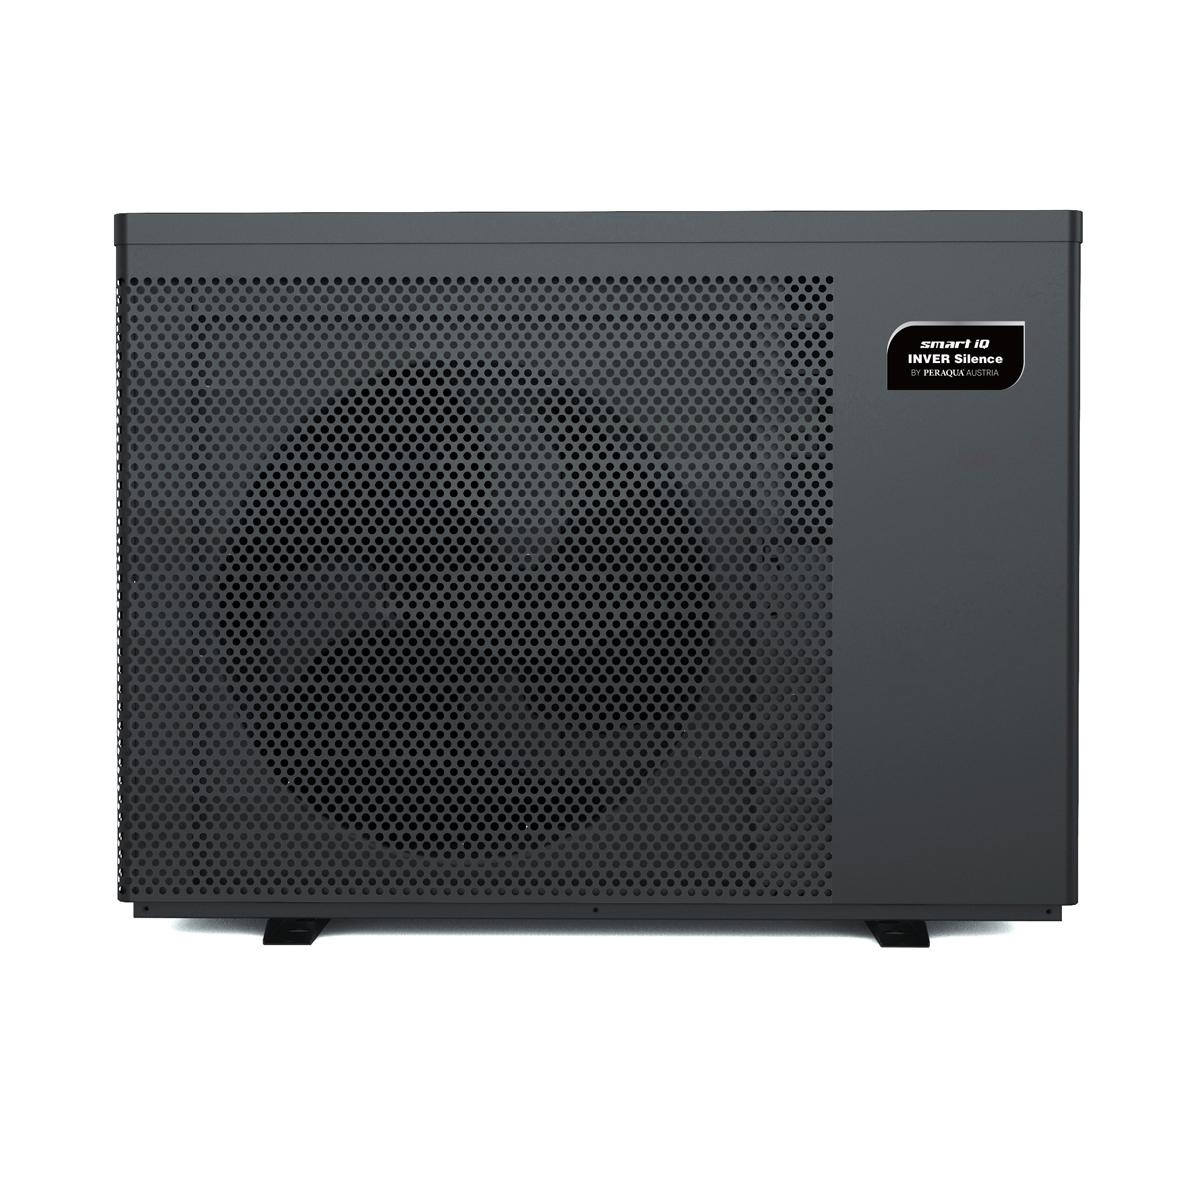 Smart iQ INVER Silence Full Inverter Wärmepumpe 10,2 kW, 230V 50Hz, Aluminium Gehäuse Smart iQ INVER Silence Full Inverter Wärmepumpe 10,2 kW, 230V 50Hz, Aluminium Gehäuse